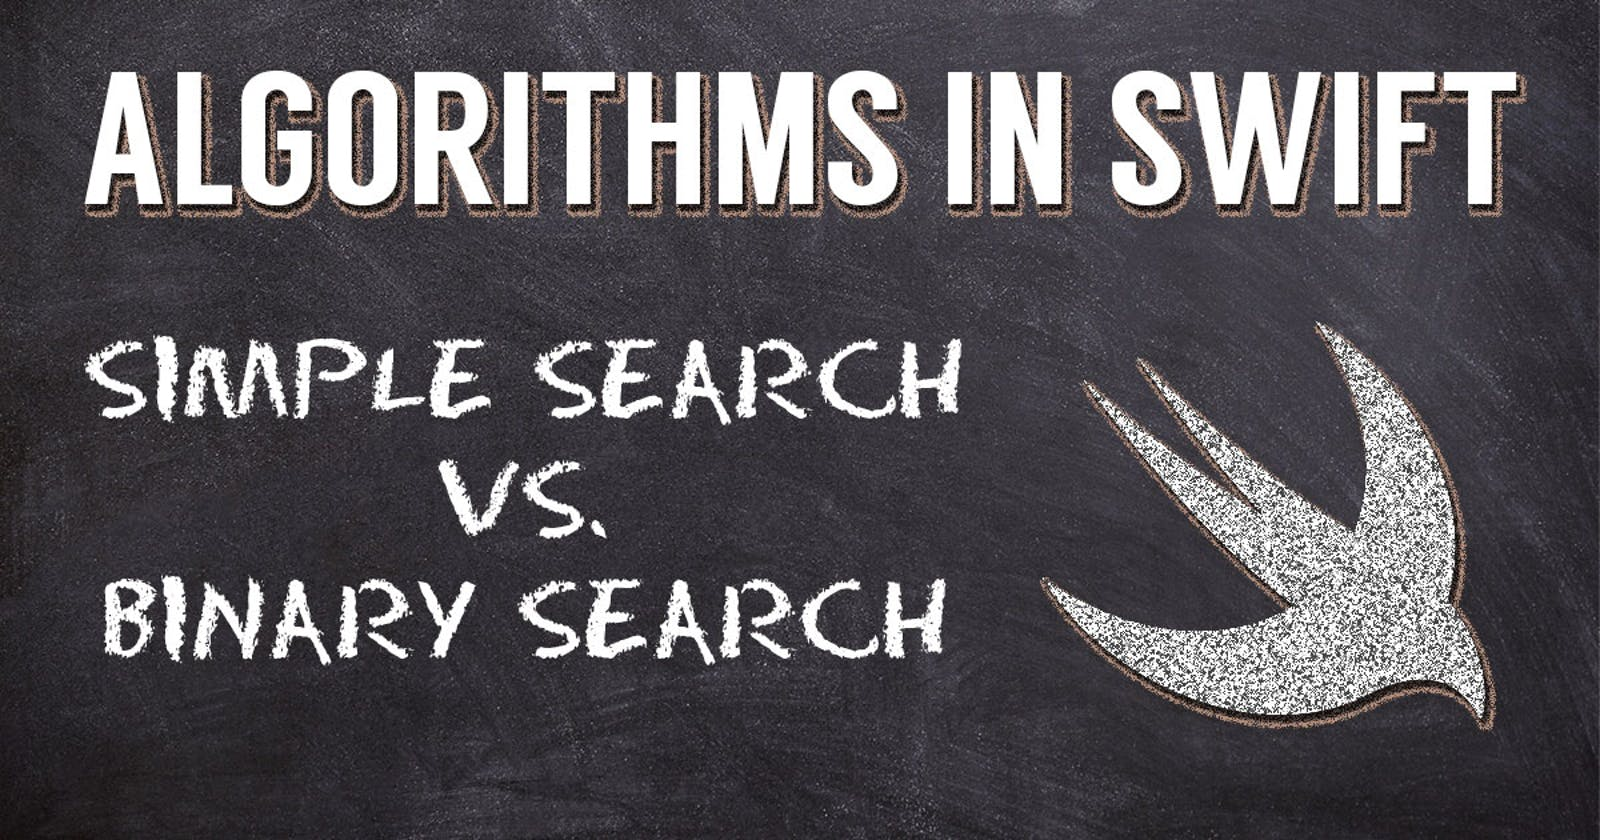 Algorithms in Swift - Binary v. Simple Search